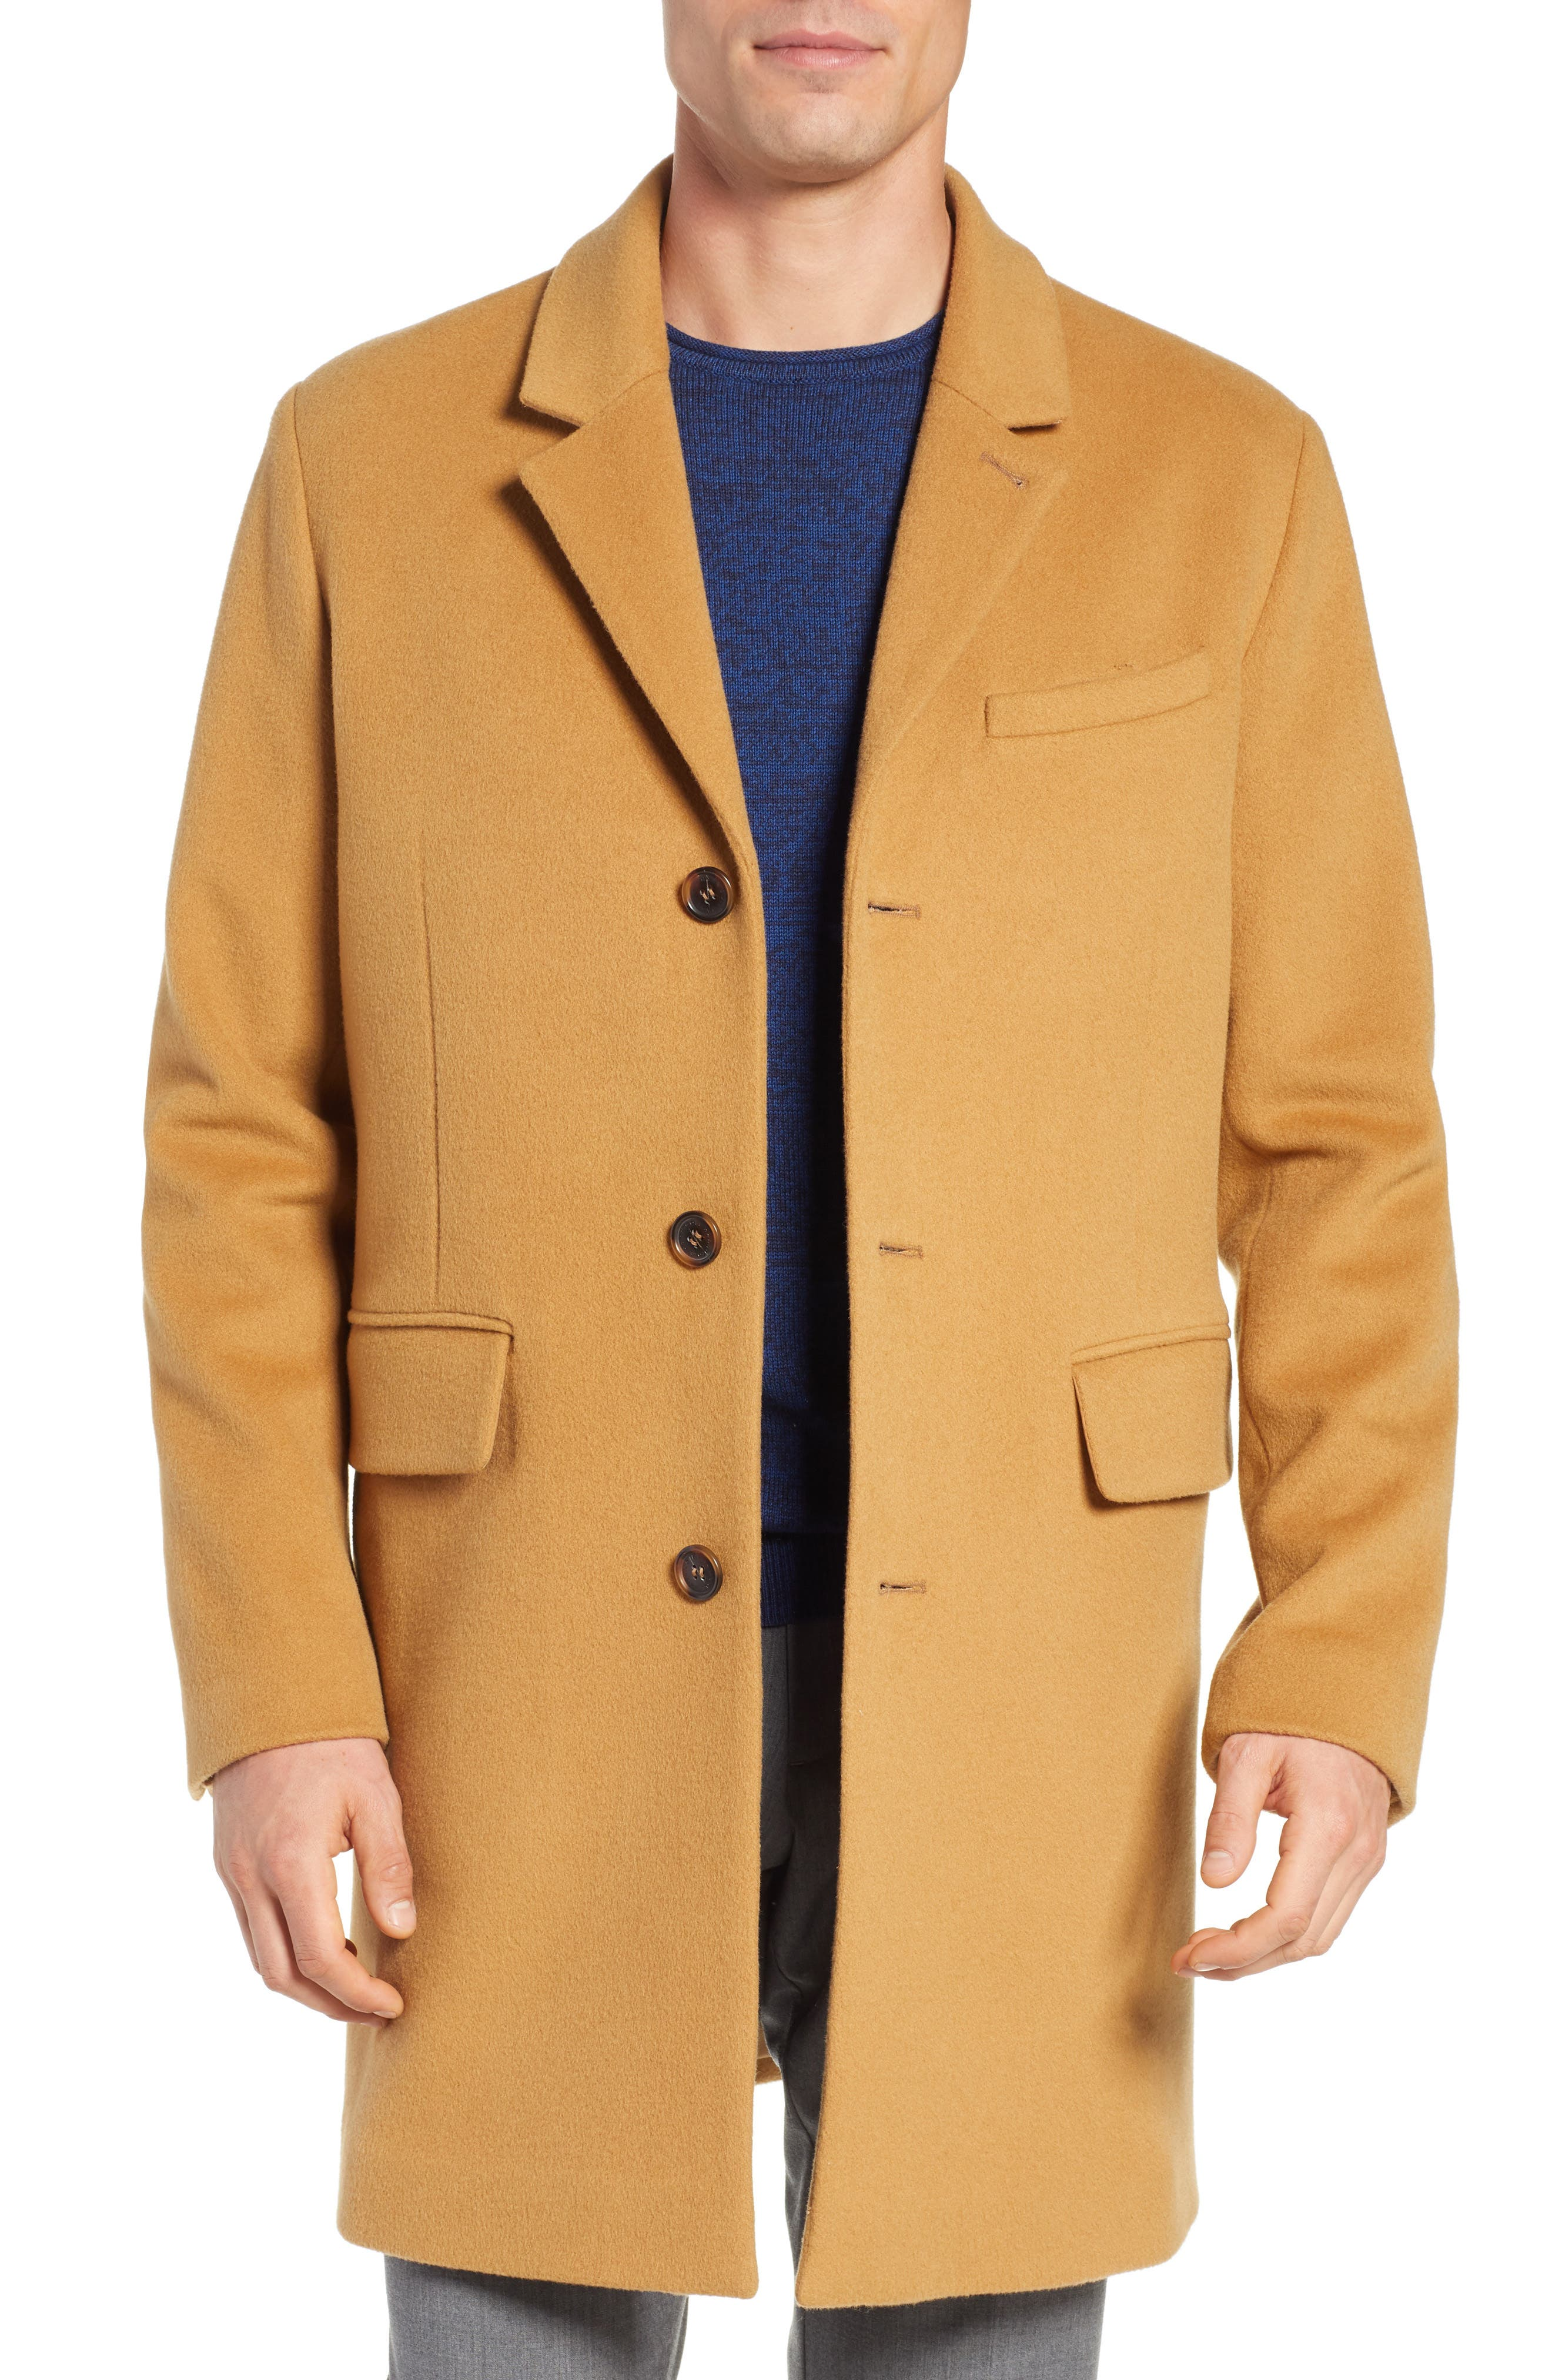 Lambswool Topcoat,                         Main,                         color, 252